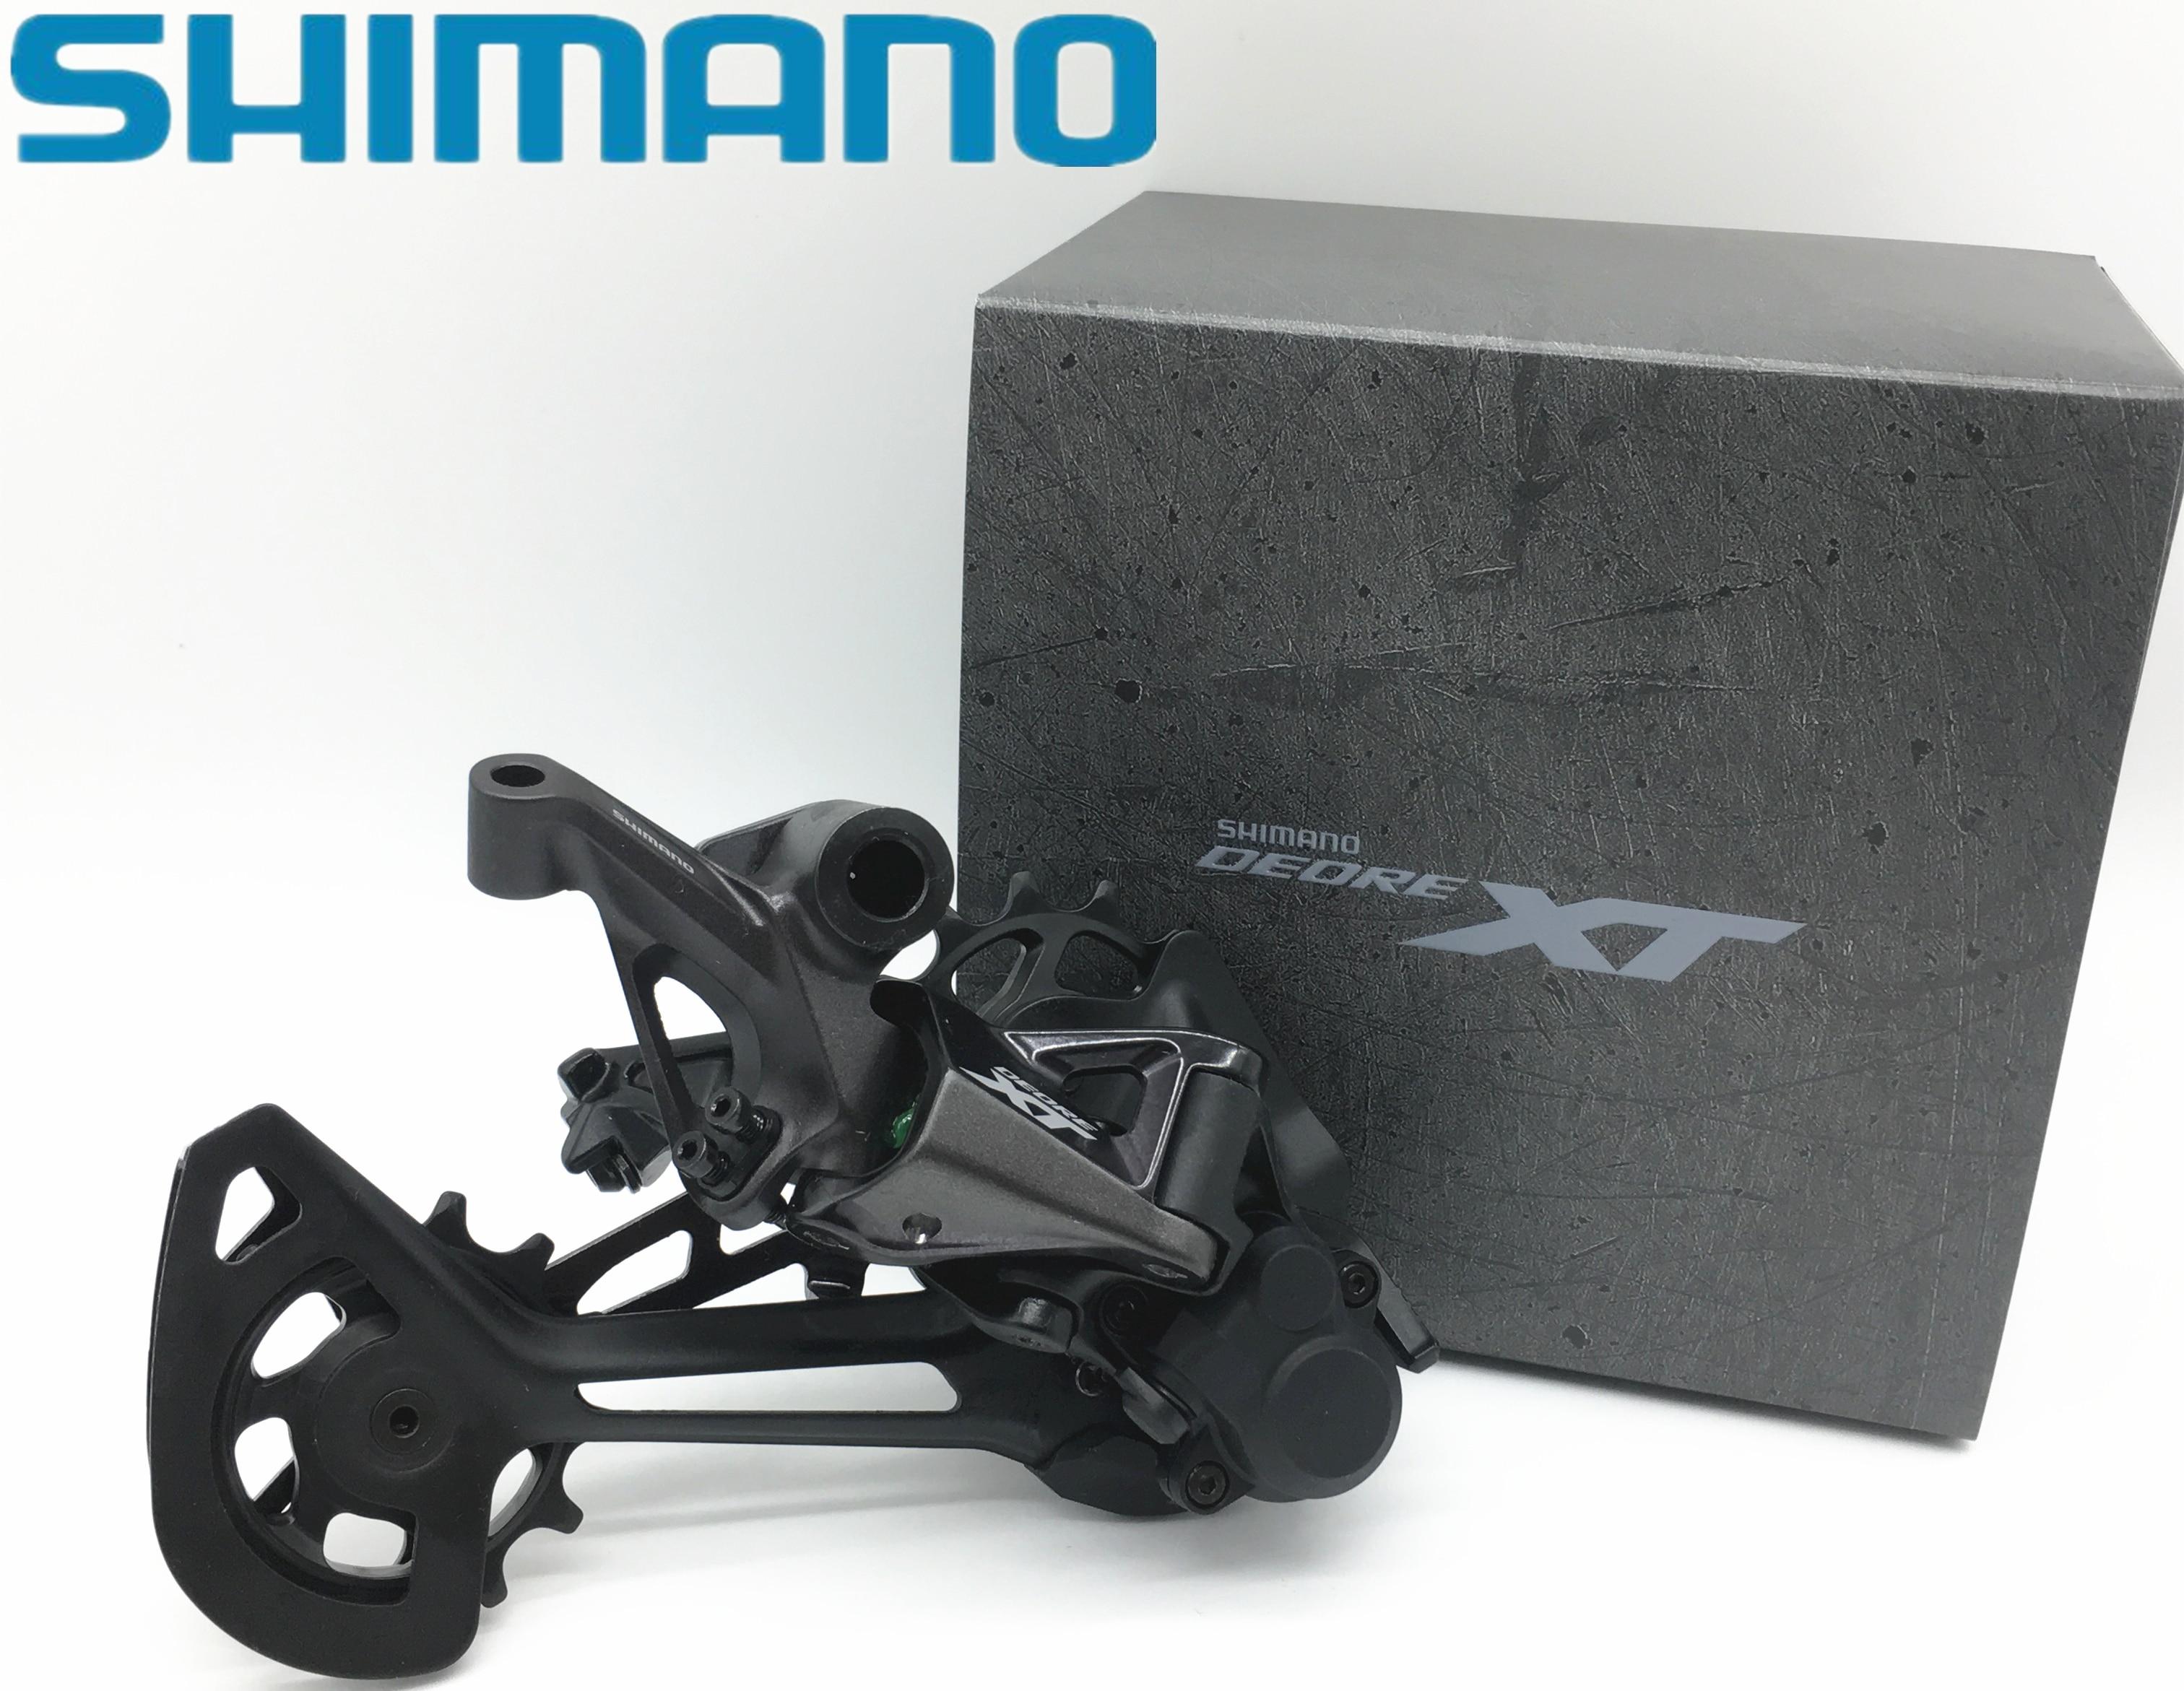 box packed SHIMANO deore xt RD M8100 rear derailleur 12S MTB bicycle bike derailleurs M8100 M8120